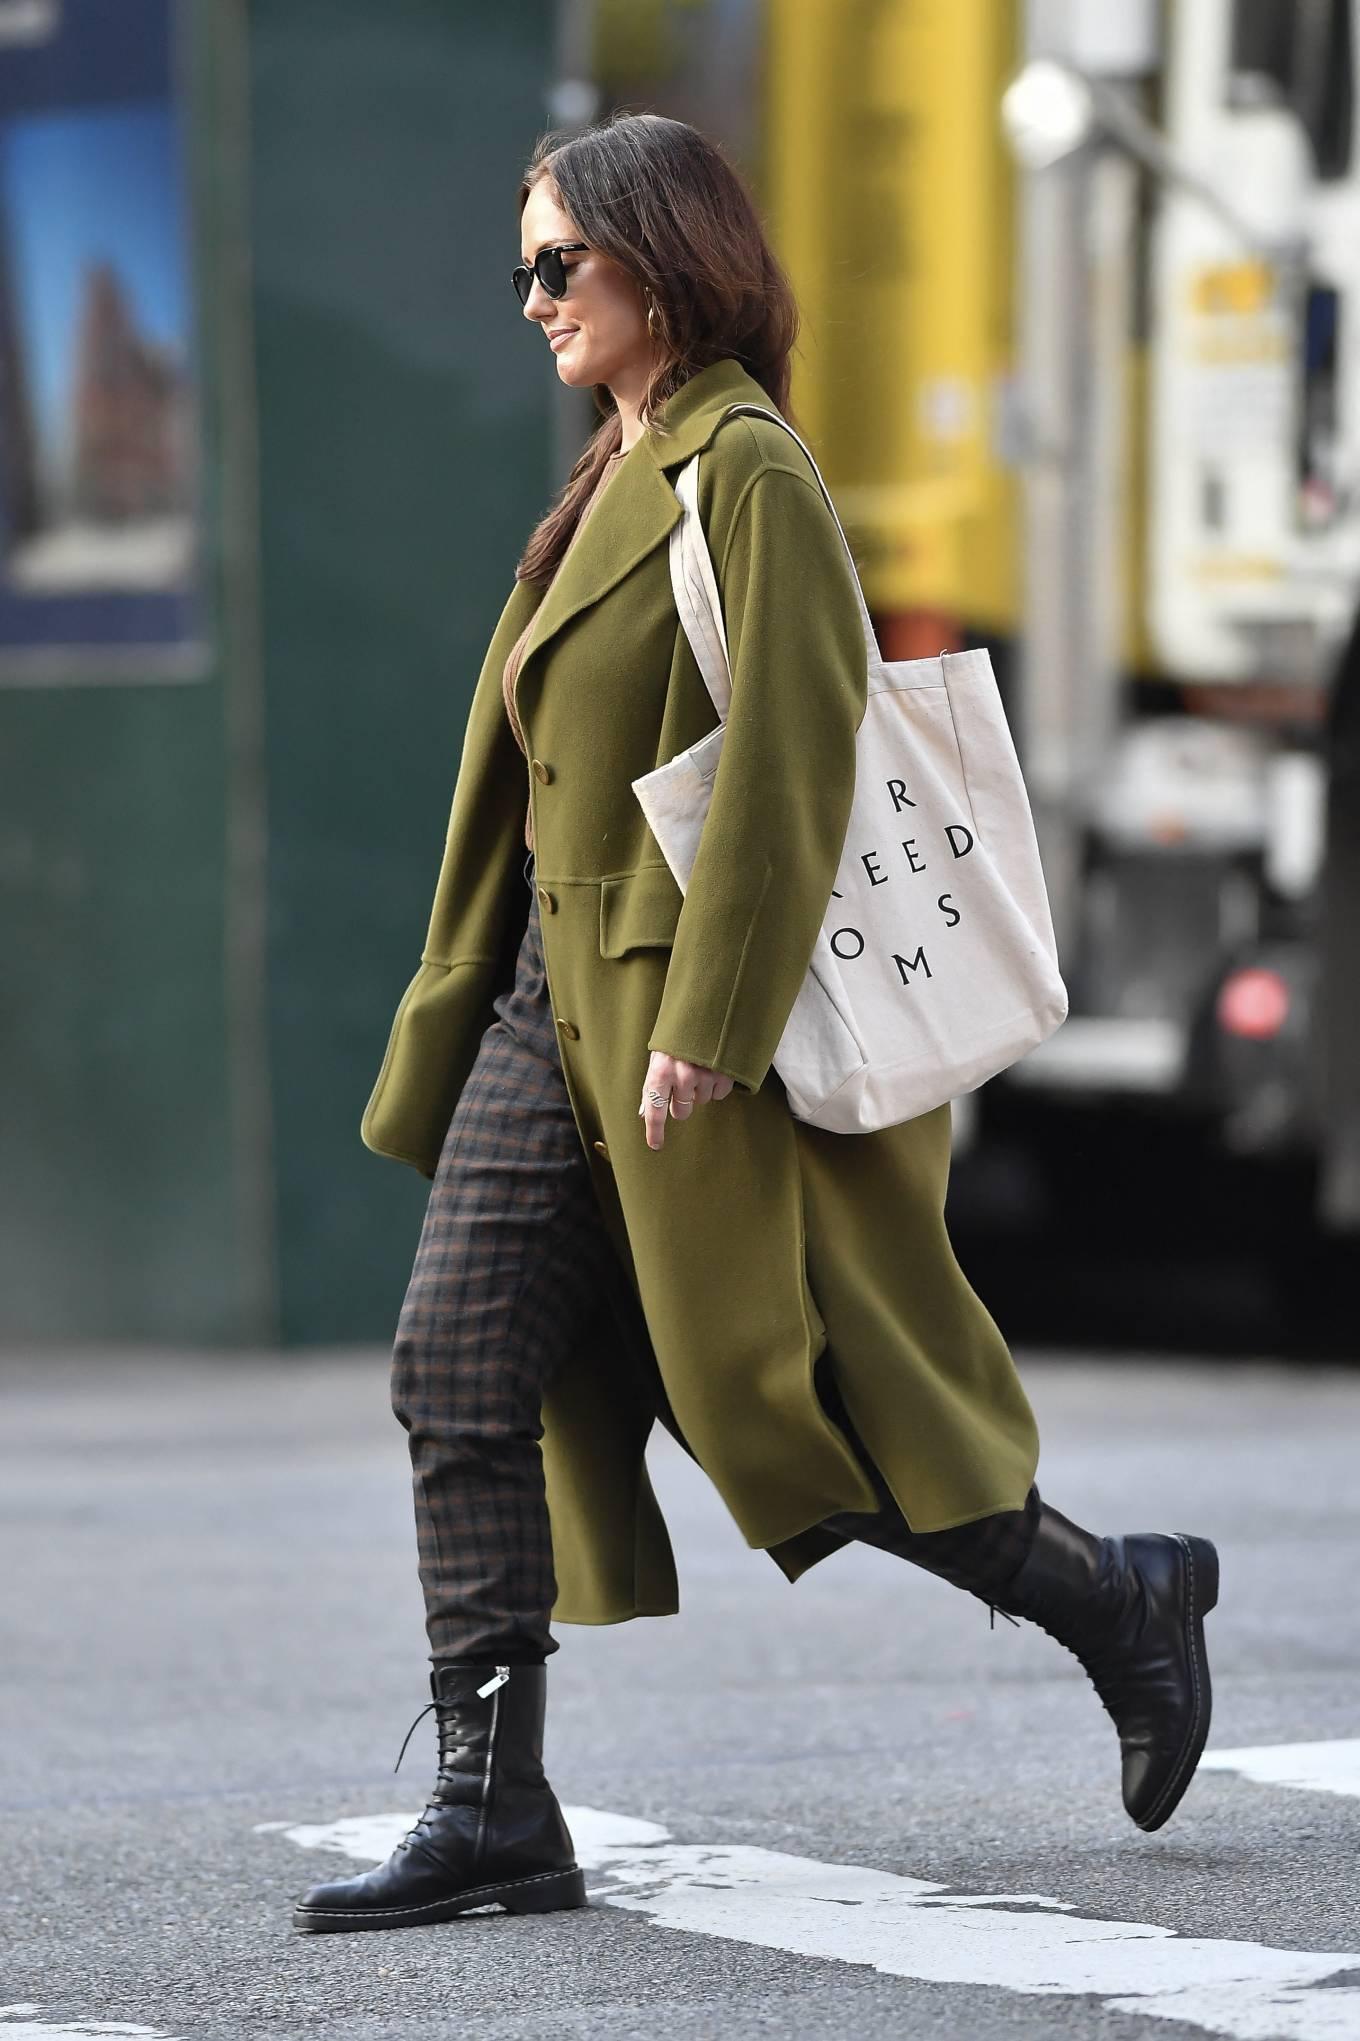 Minka Kelly 2021 : Minka Kelly – In olive green runs errands in New York-21